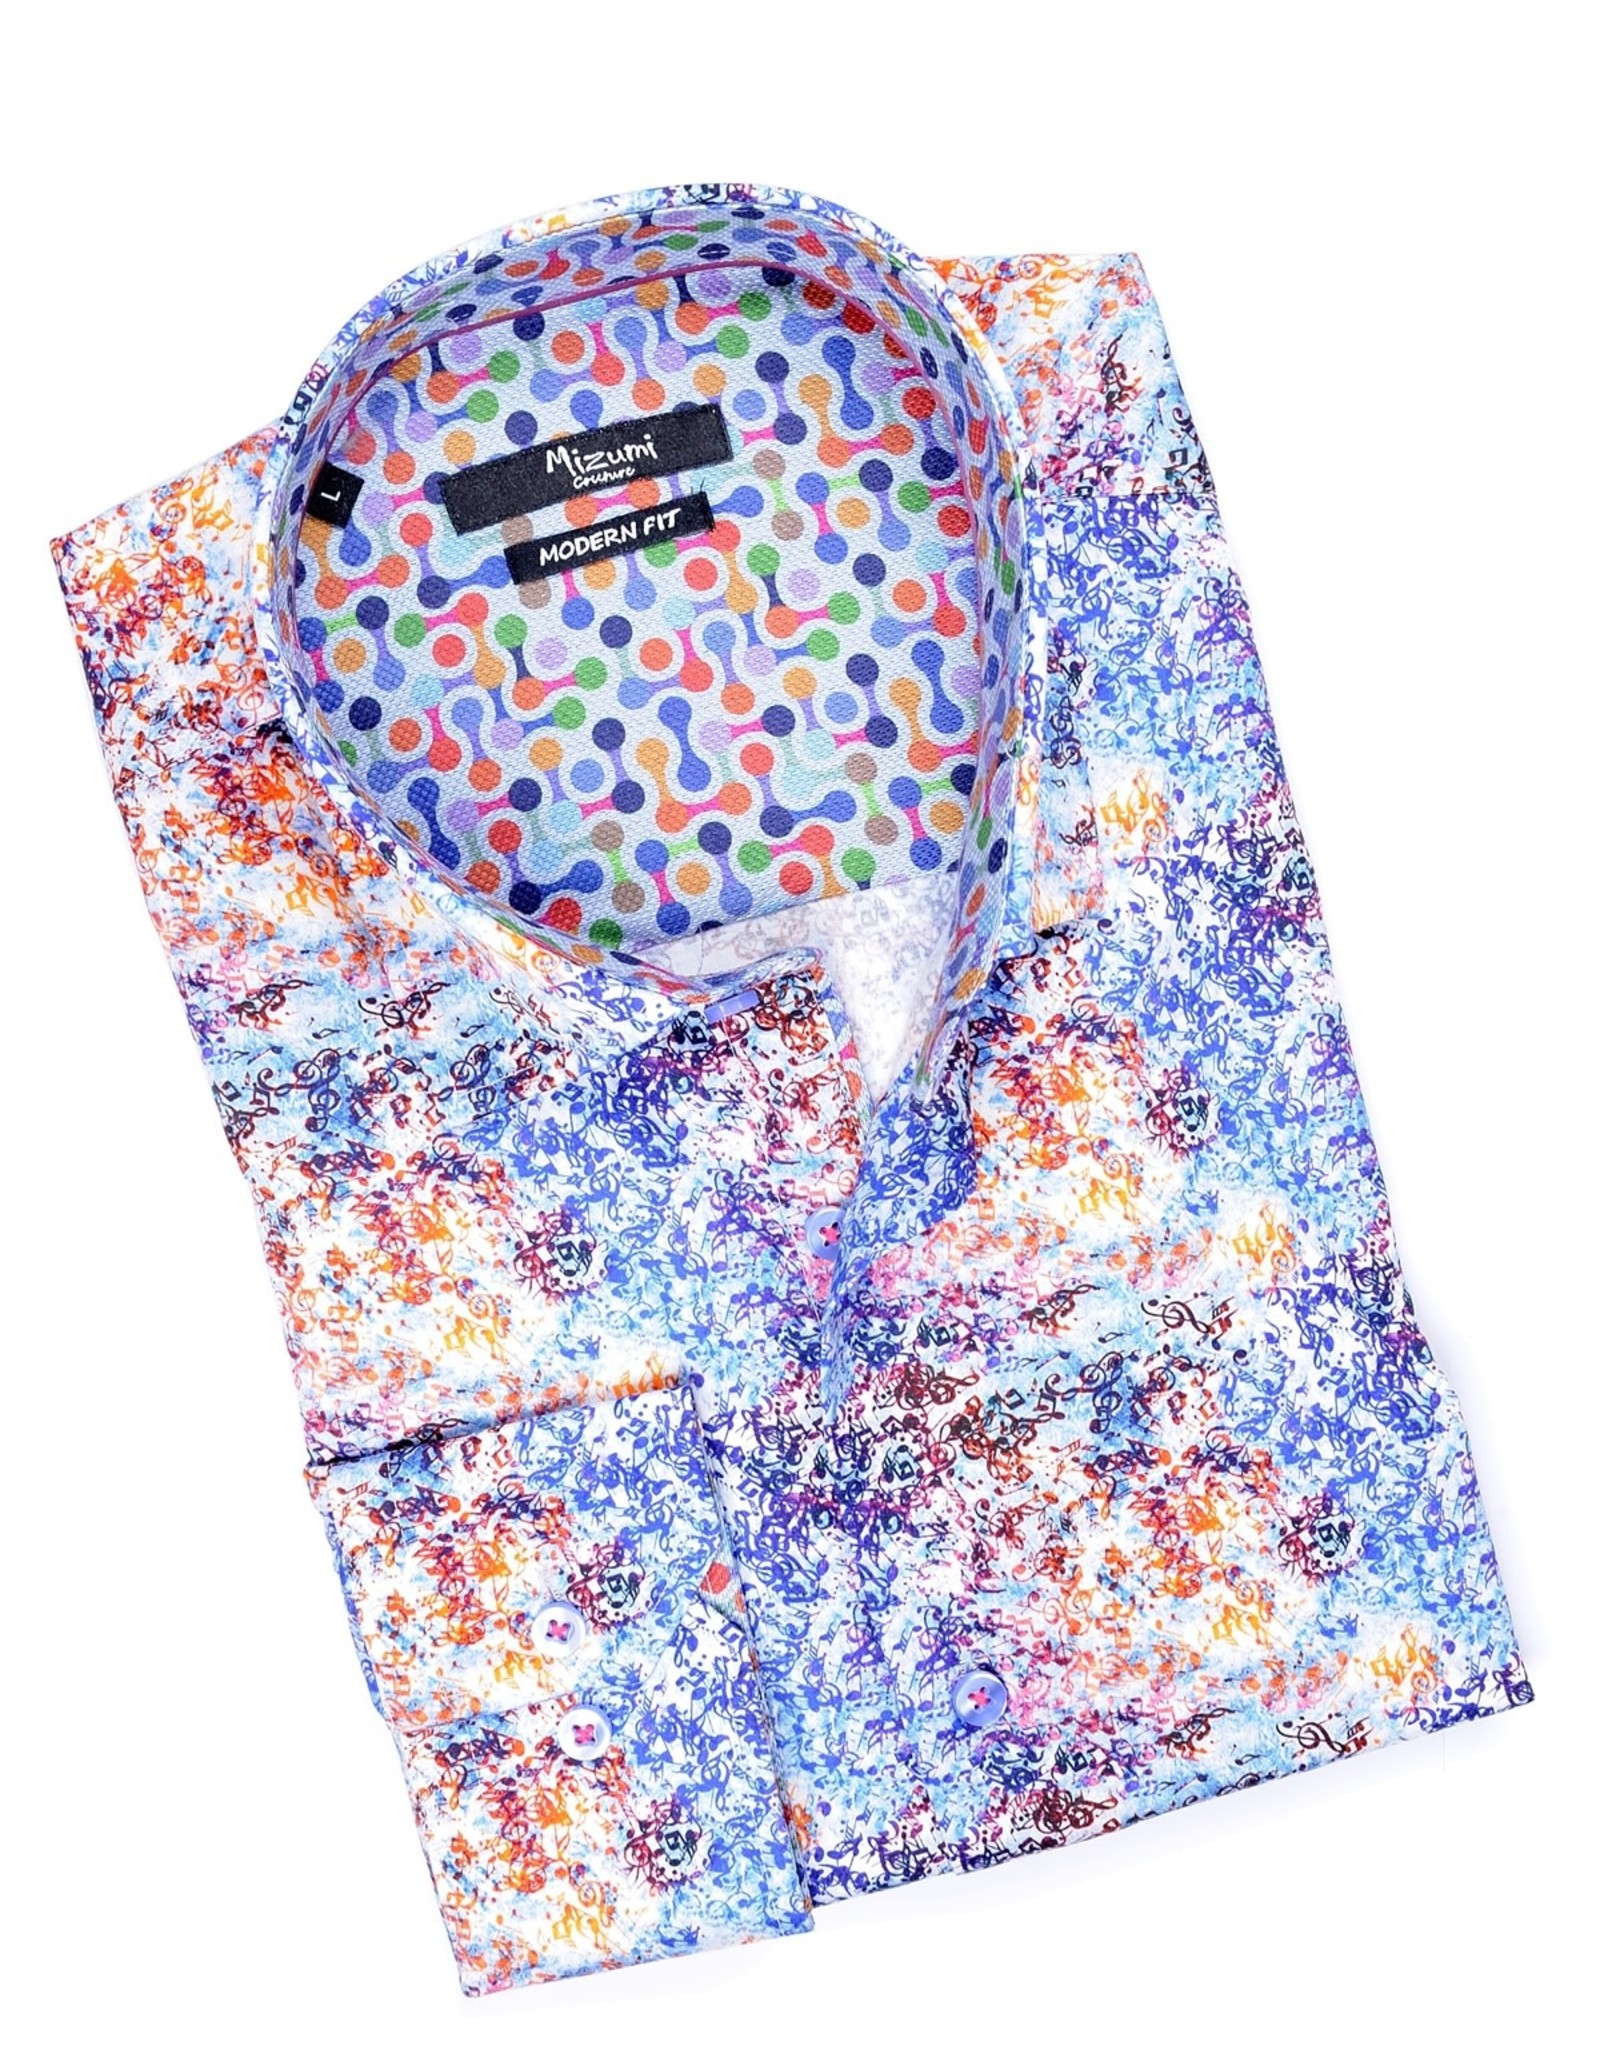 Mizumi Mizumi Multi Color Squiggles Long Sleeve Shirt